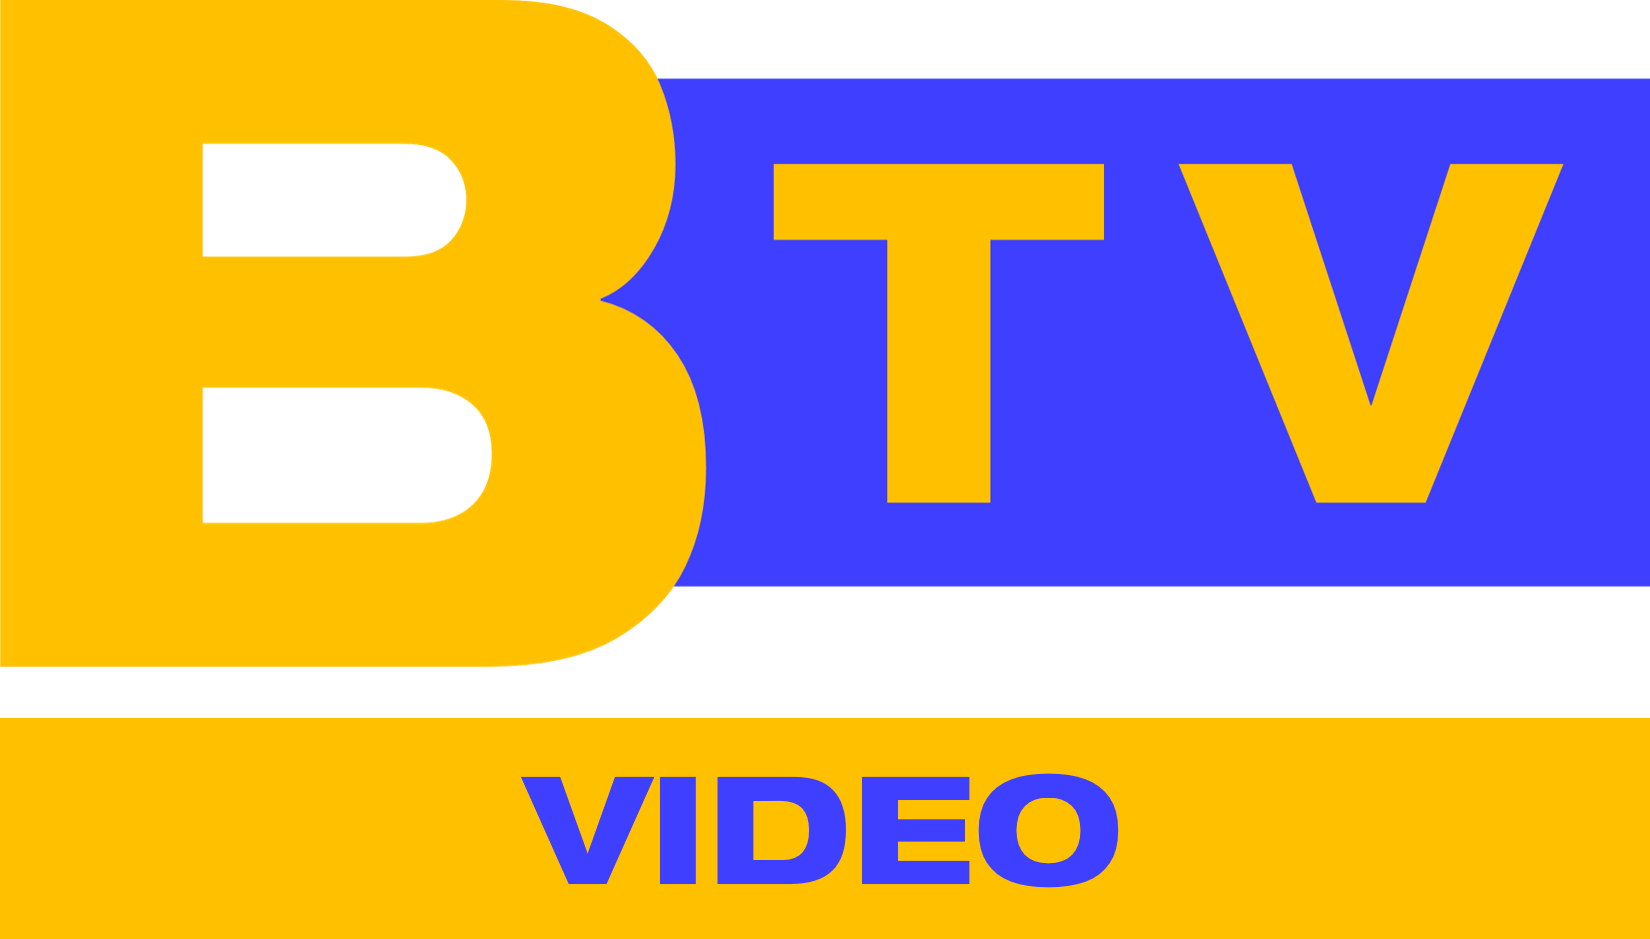 BTV Video